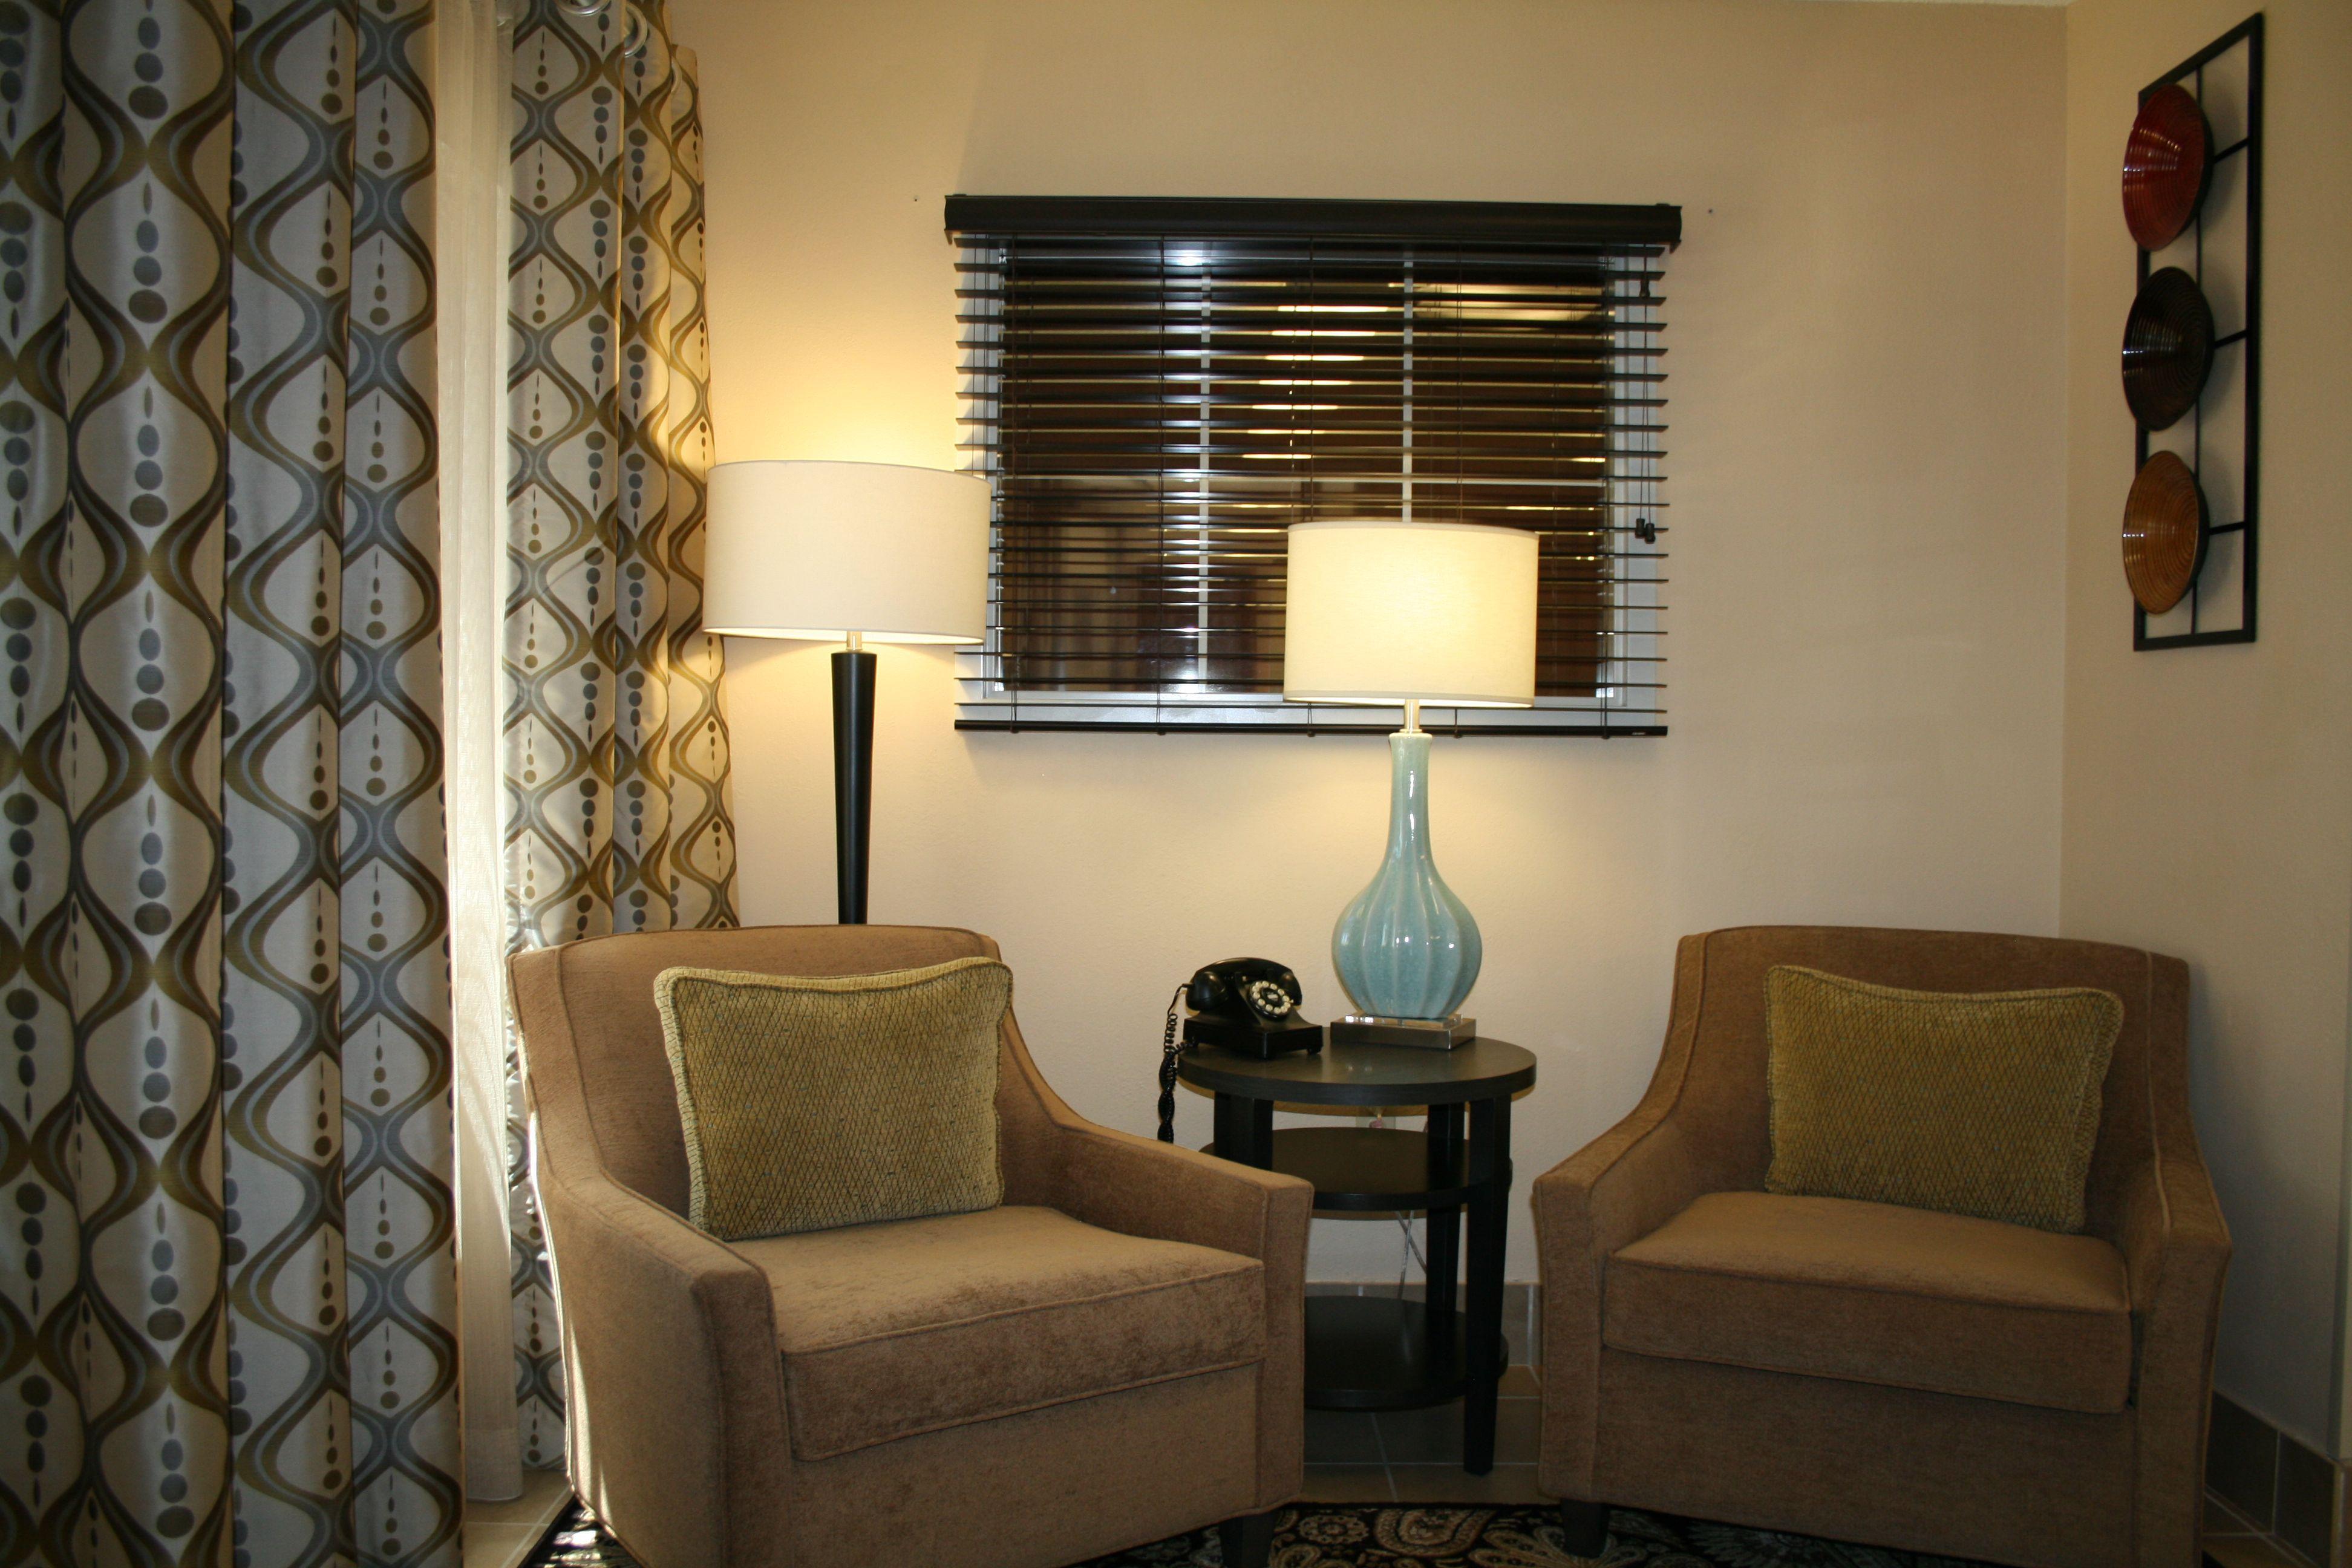 Candlewood Suites Arlington image 3